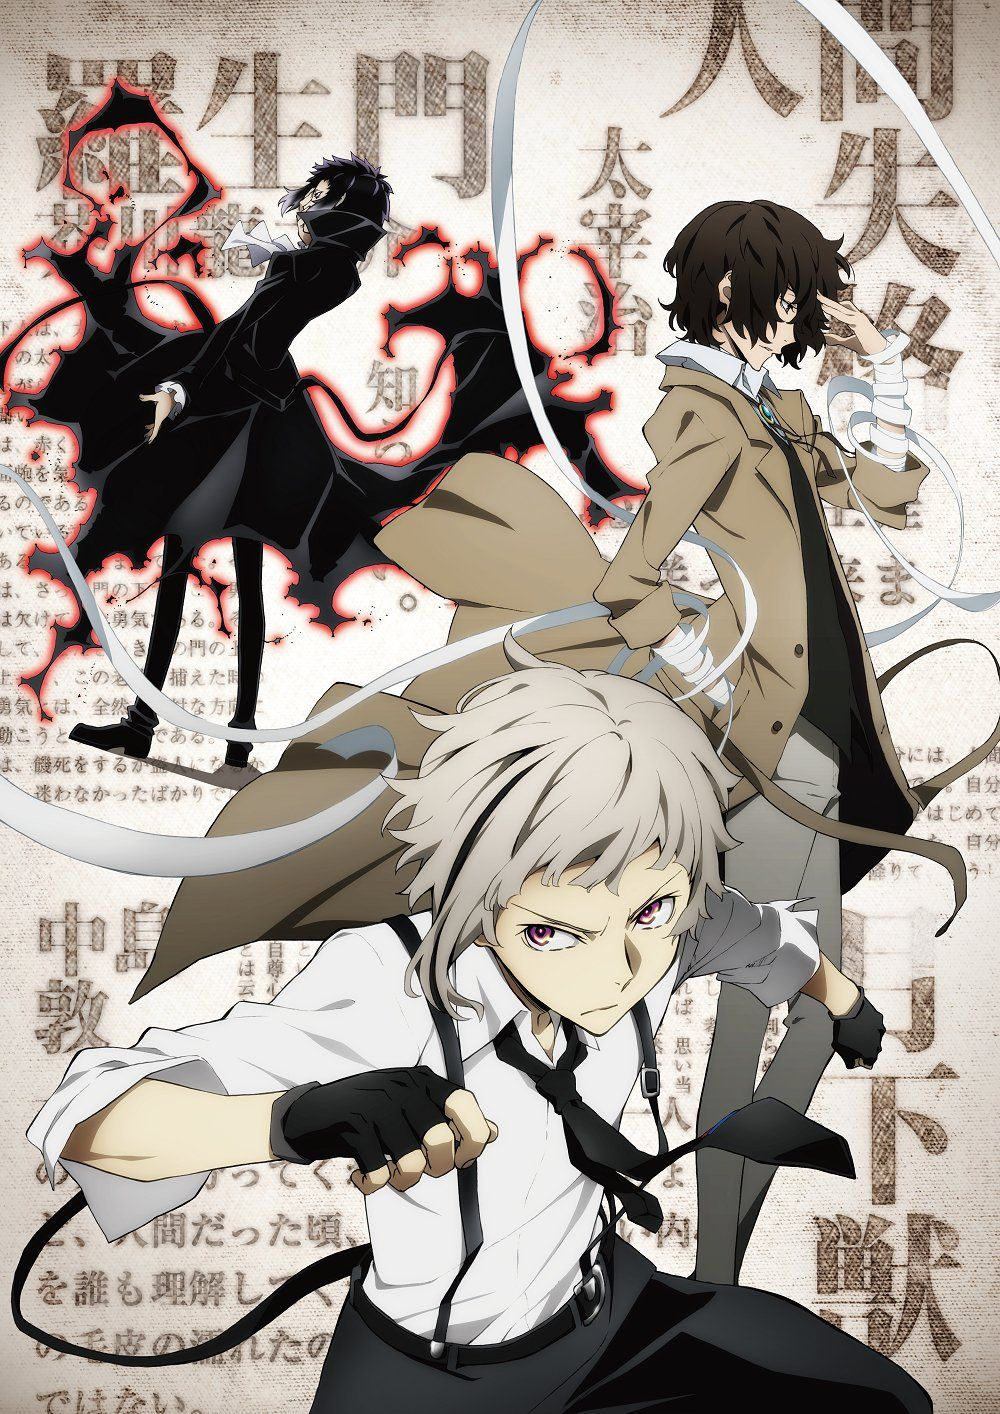 Anime vostfr Dessin animé manga, Chien tumblr, Chien